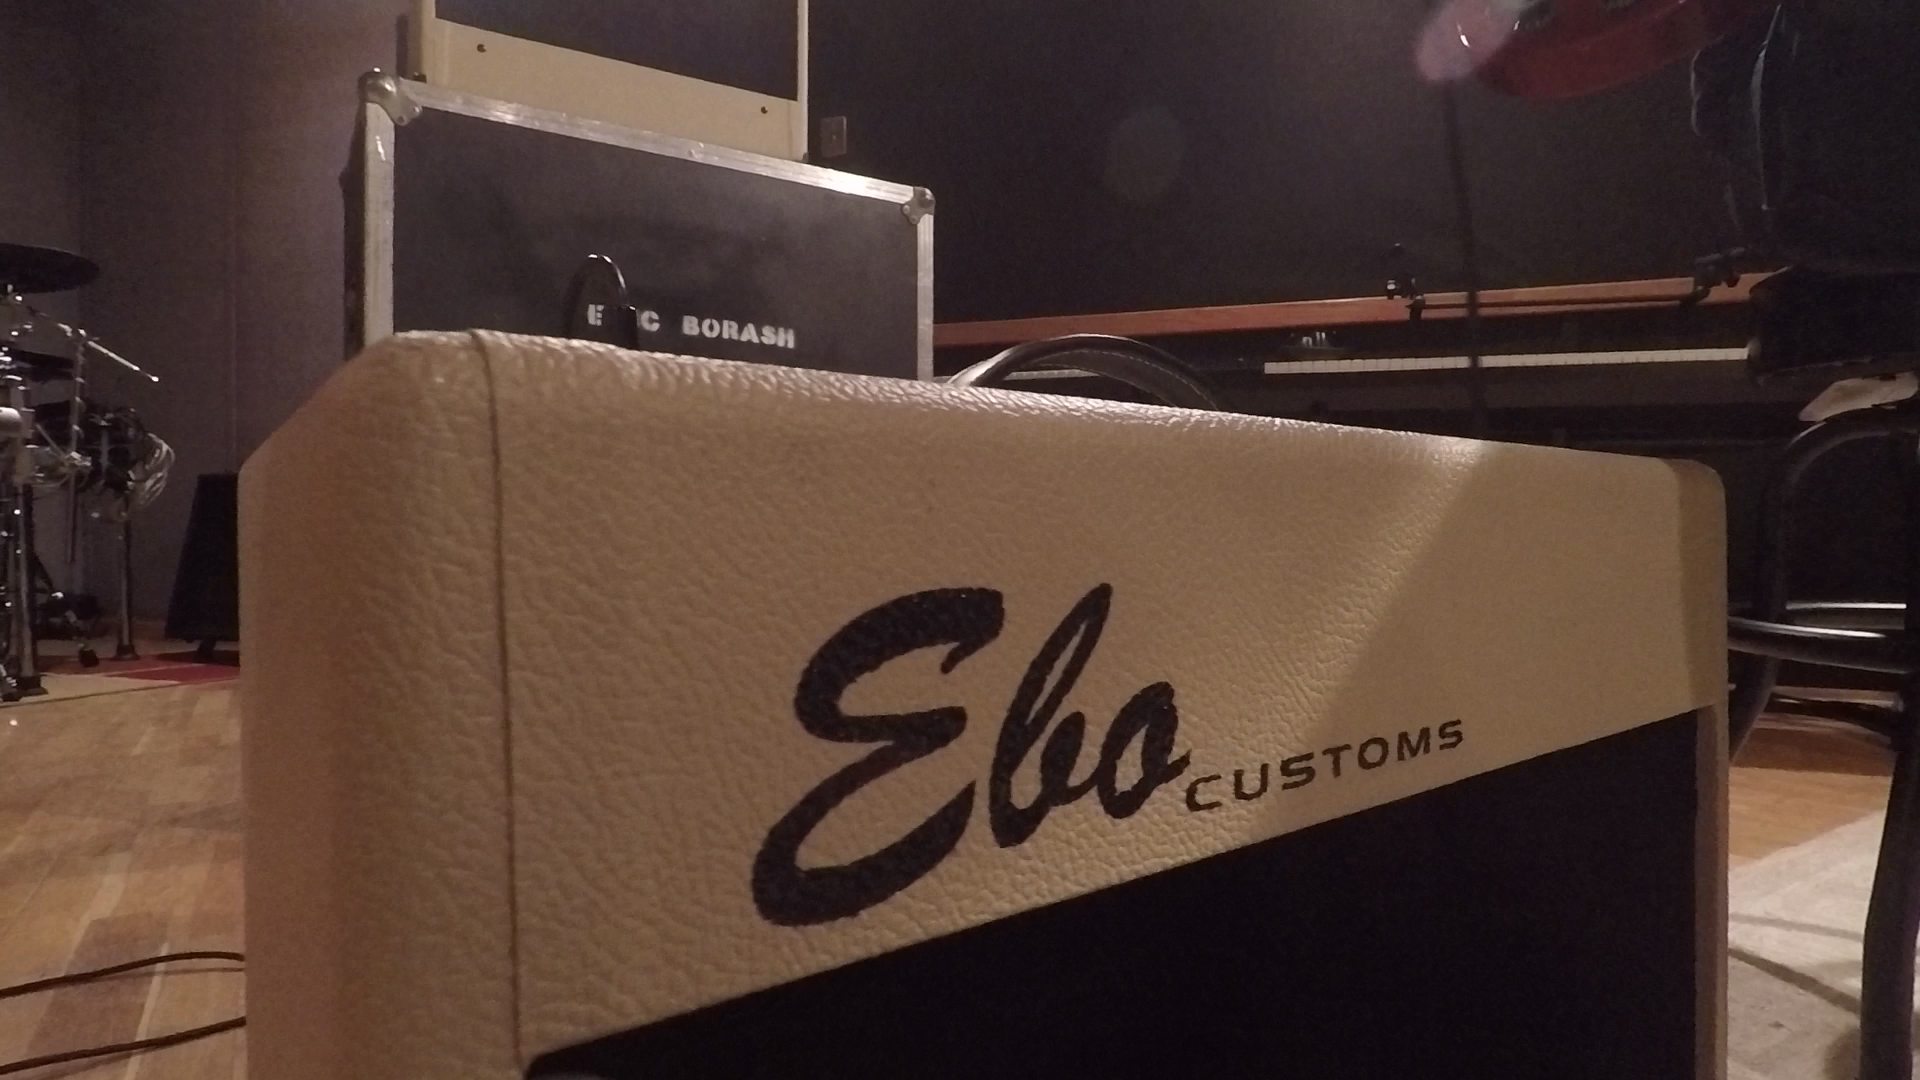 The Ebo Customs BAR FLY -